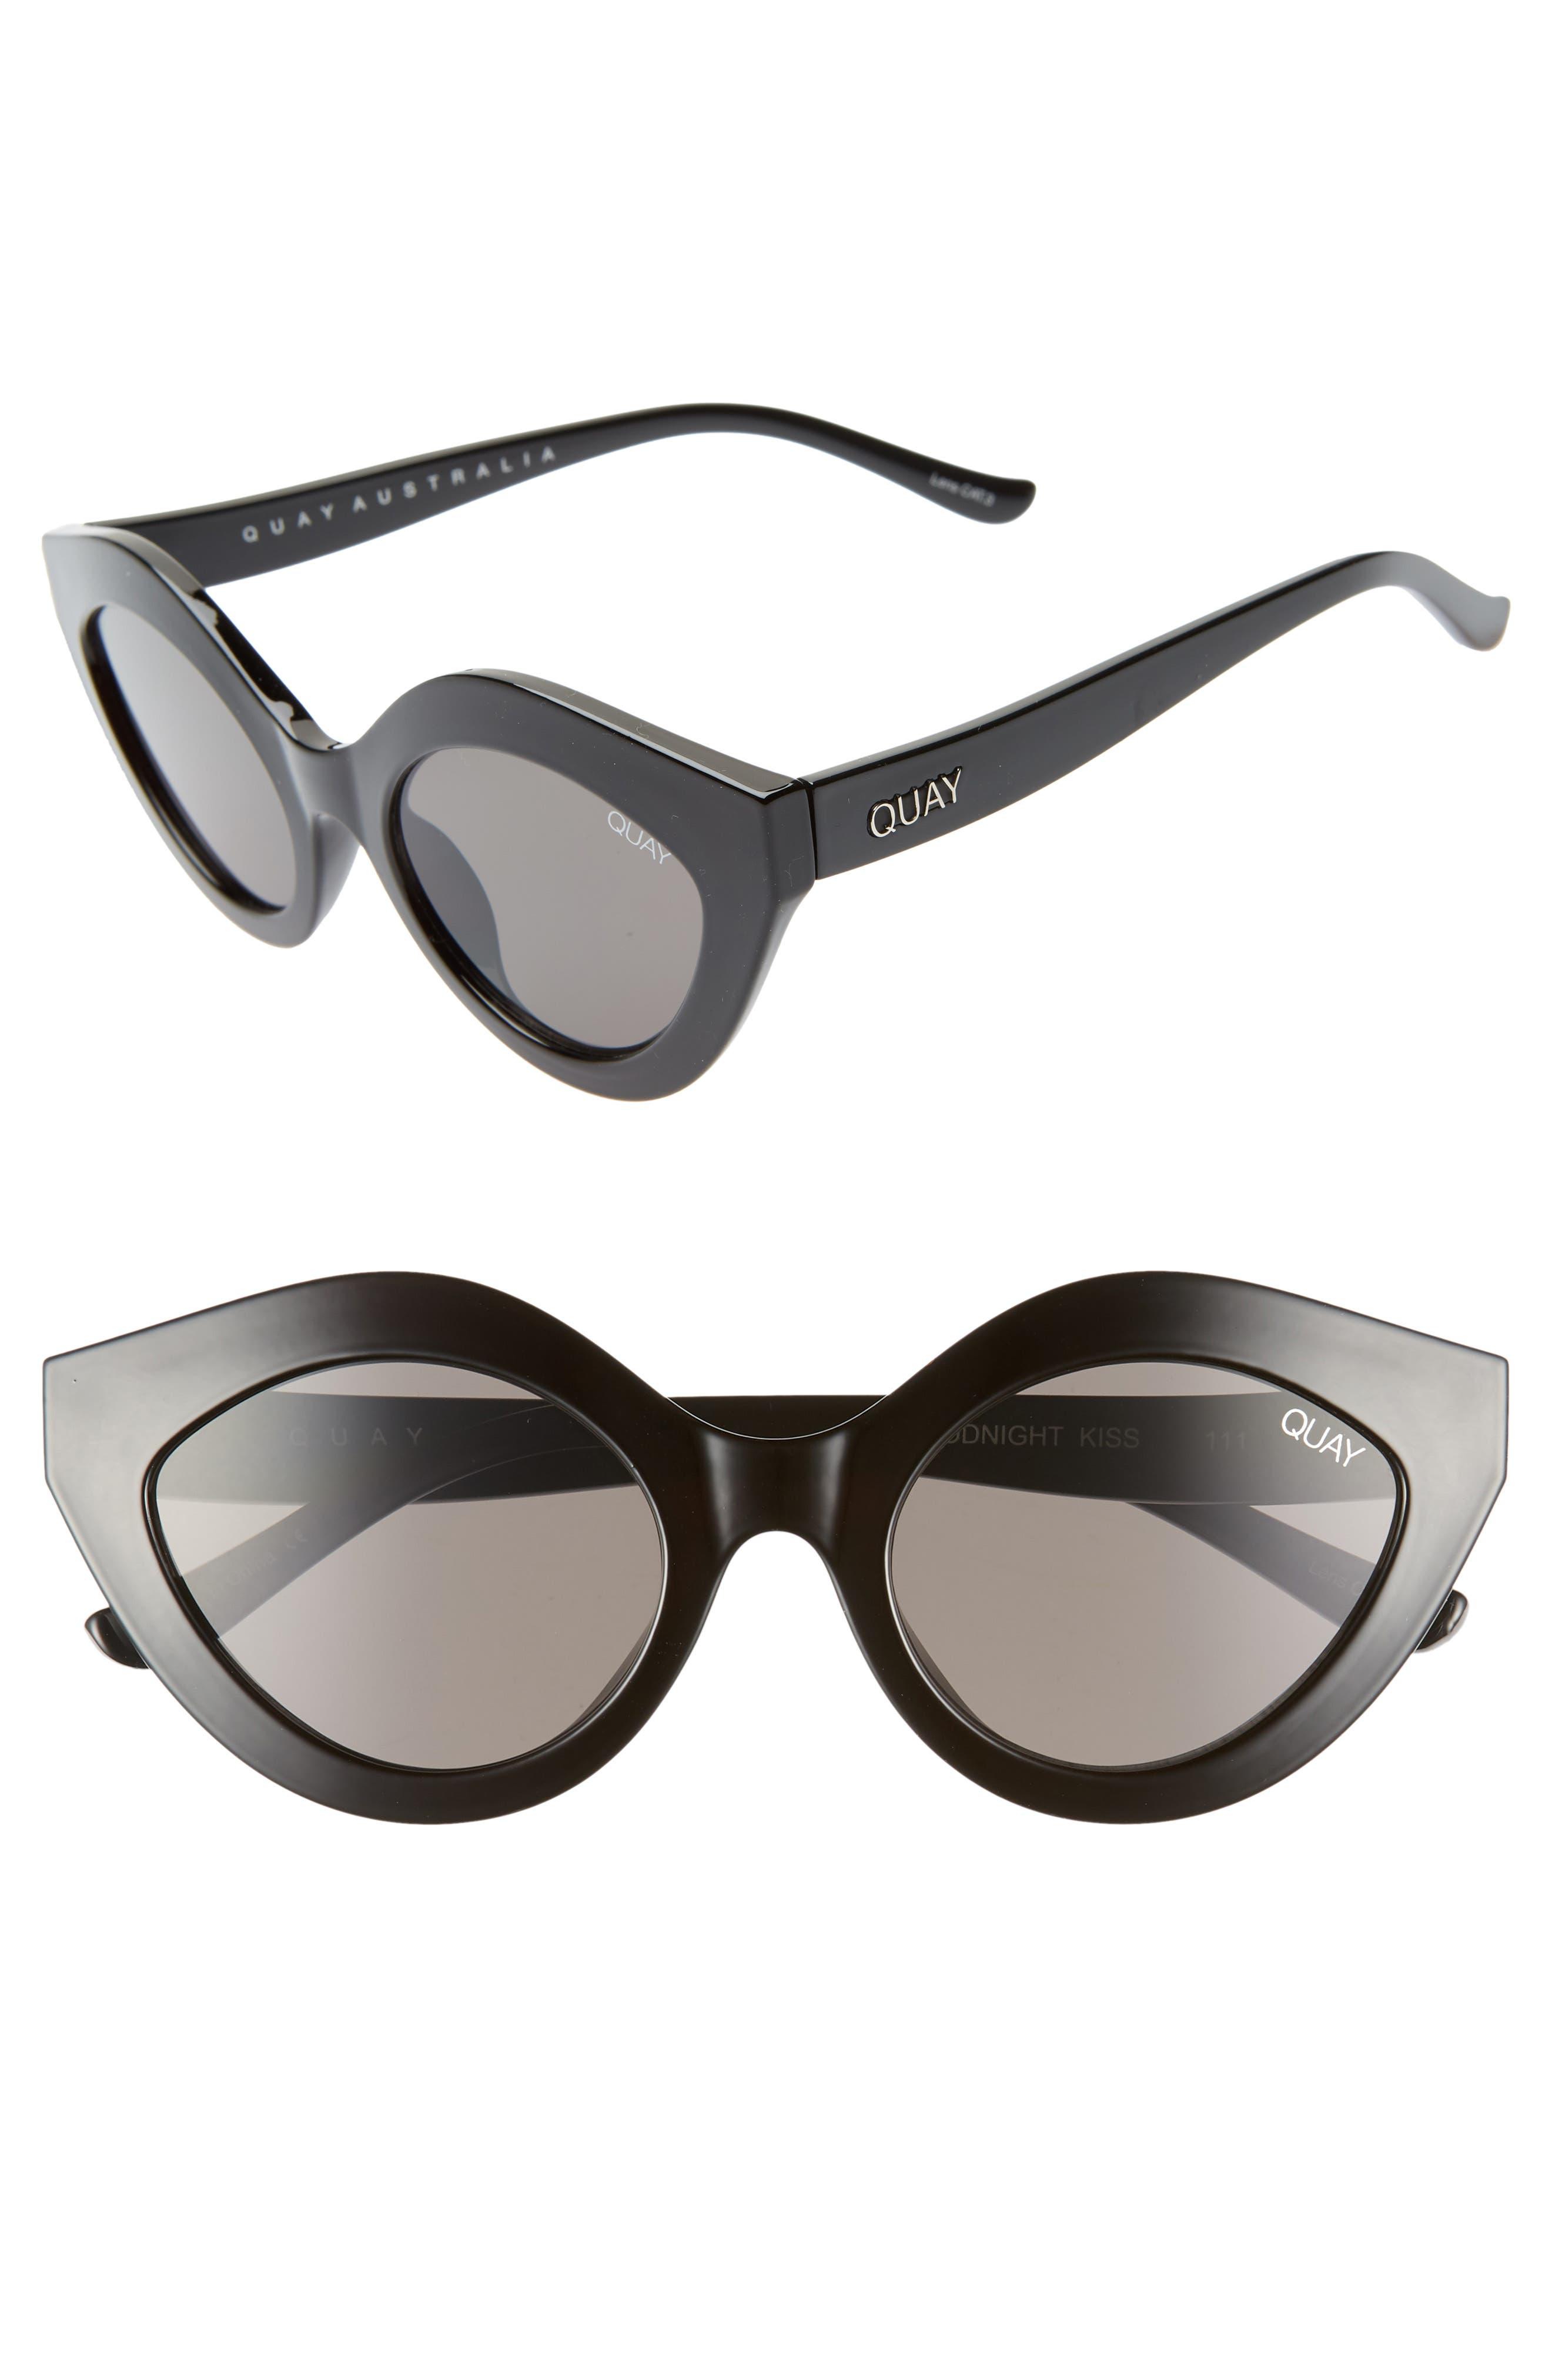 61e157d9df5dc Quay Australia Goodnight Kiss Cat Eye Sunglasses - Black   Smoke